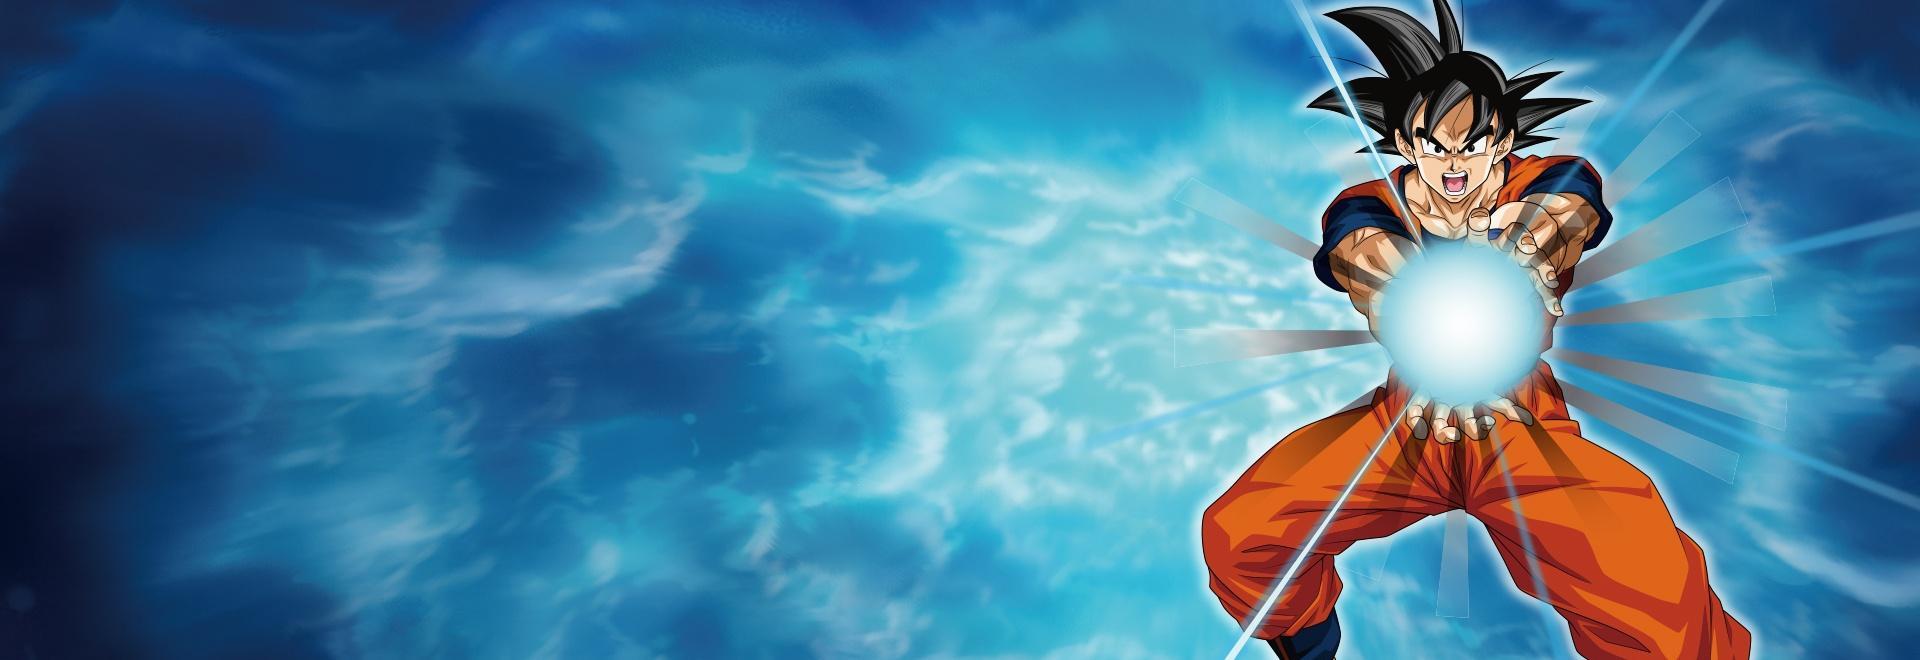 Goku, spingiti oltre il Super Saiyan God!